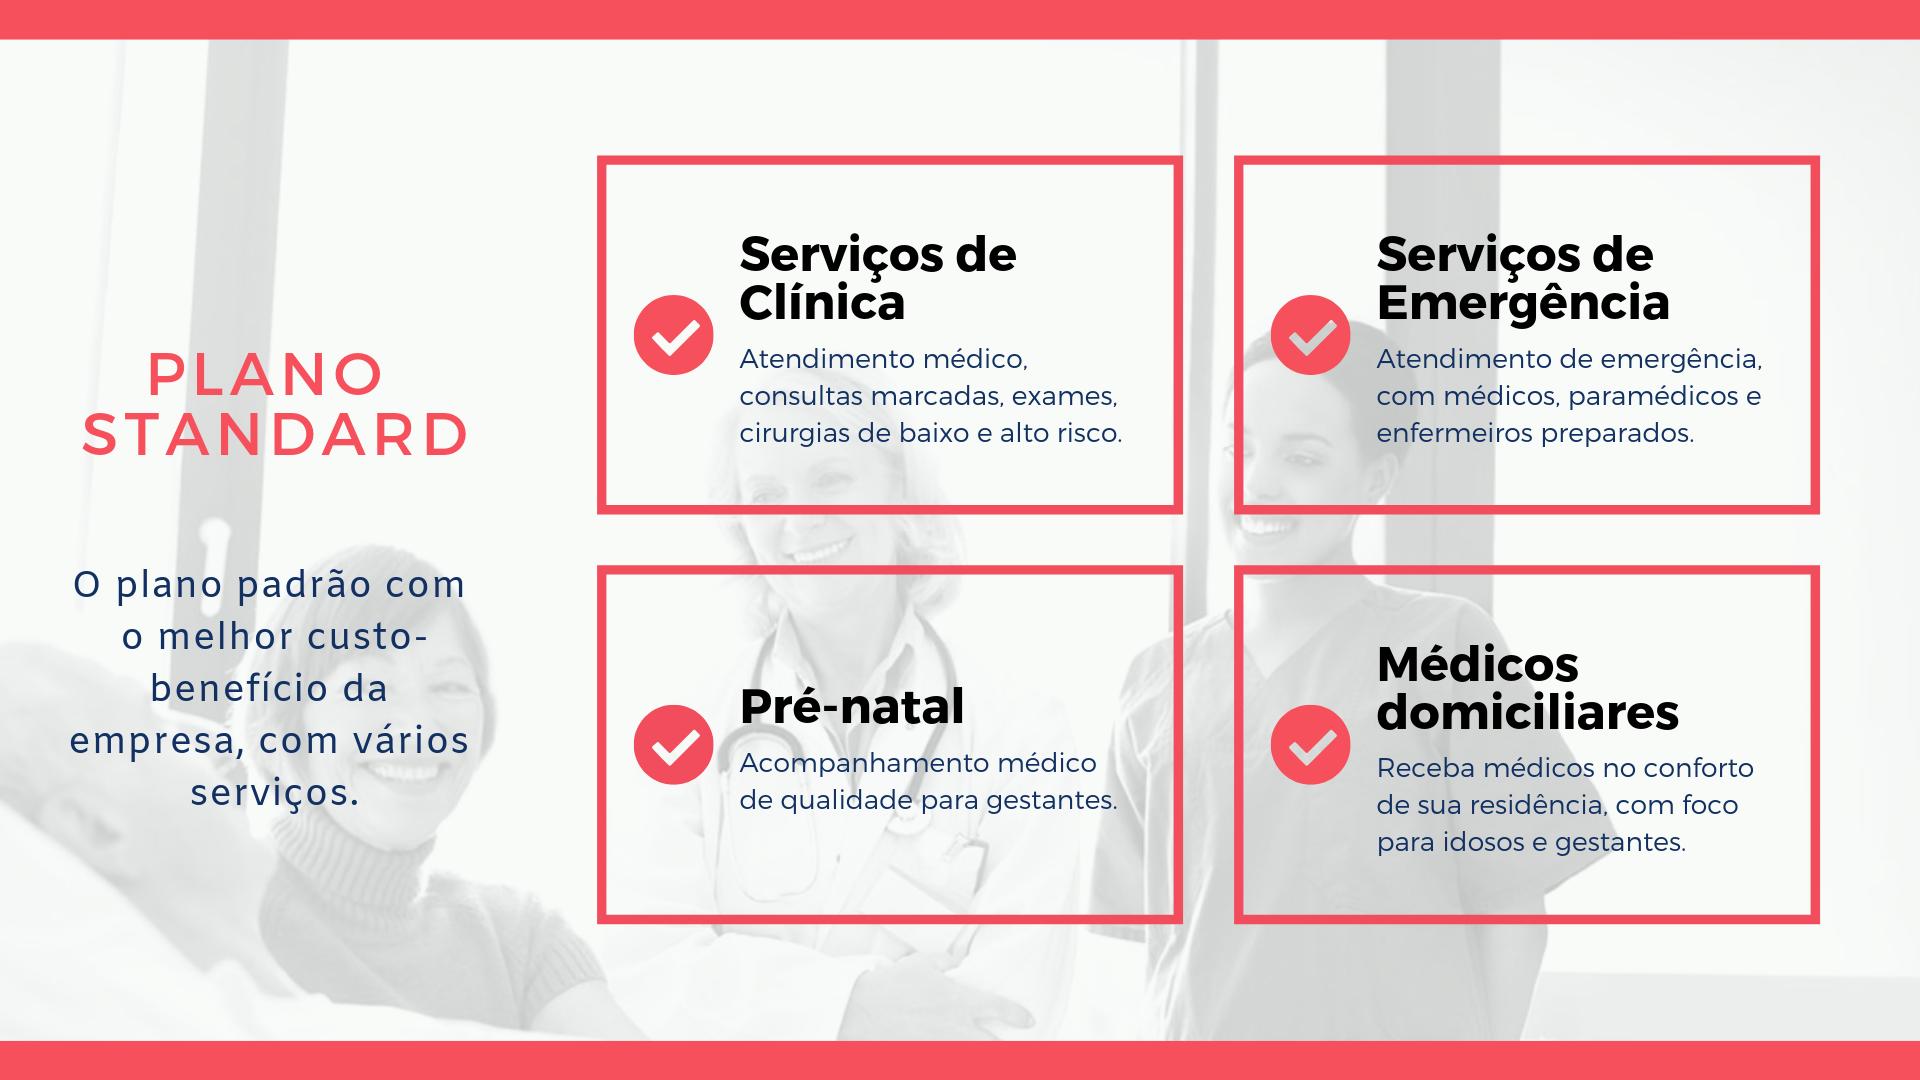 [Plano de Saúde] STANDARD Plano_standard